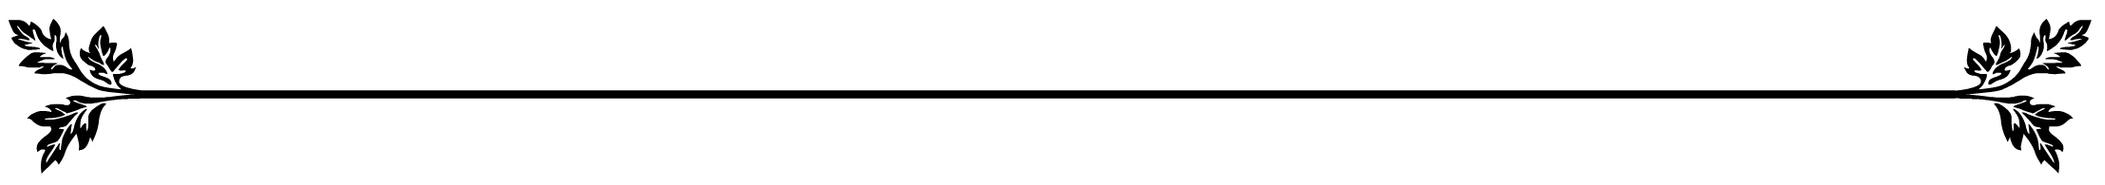 line flourish.jpg